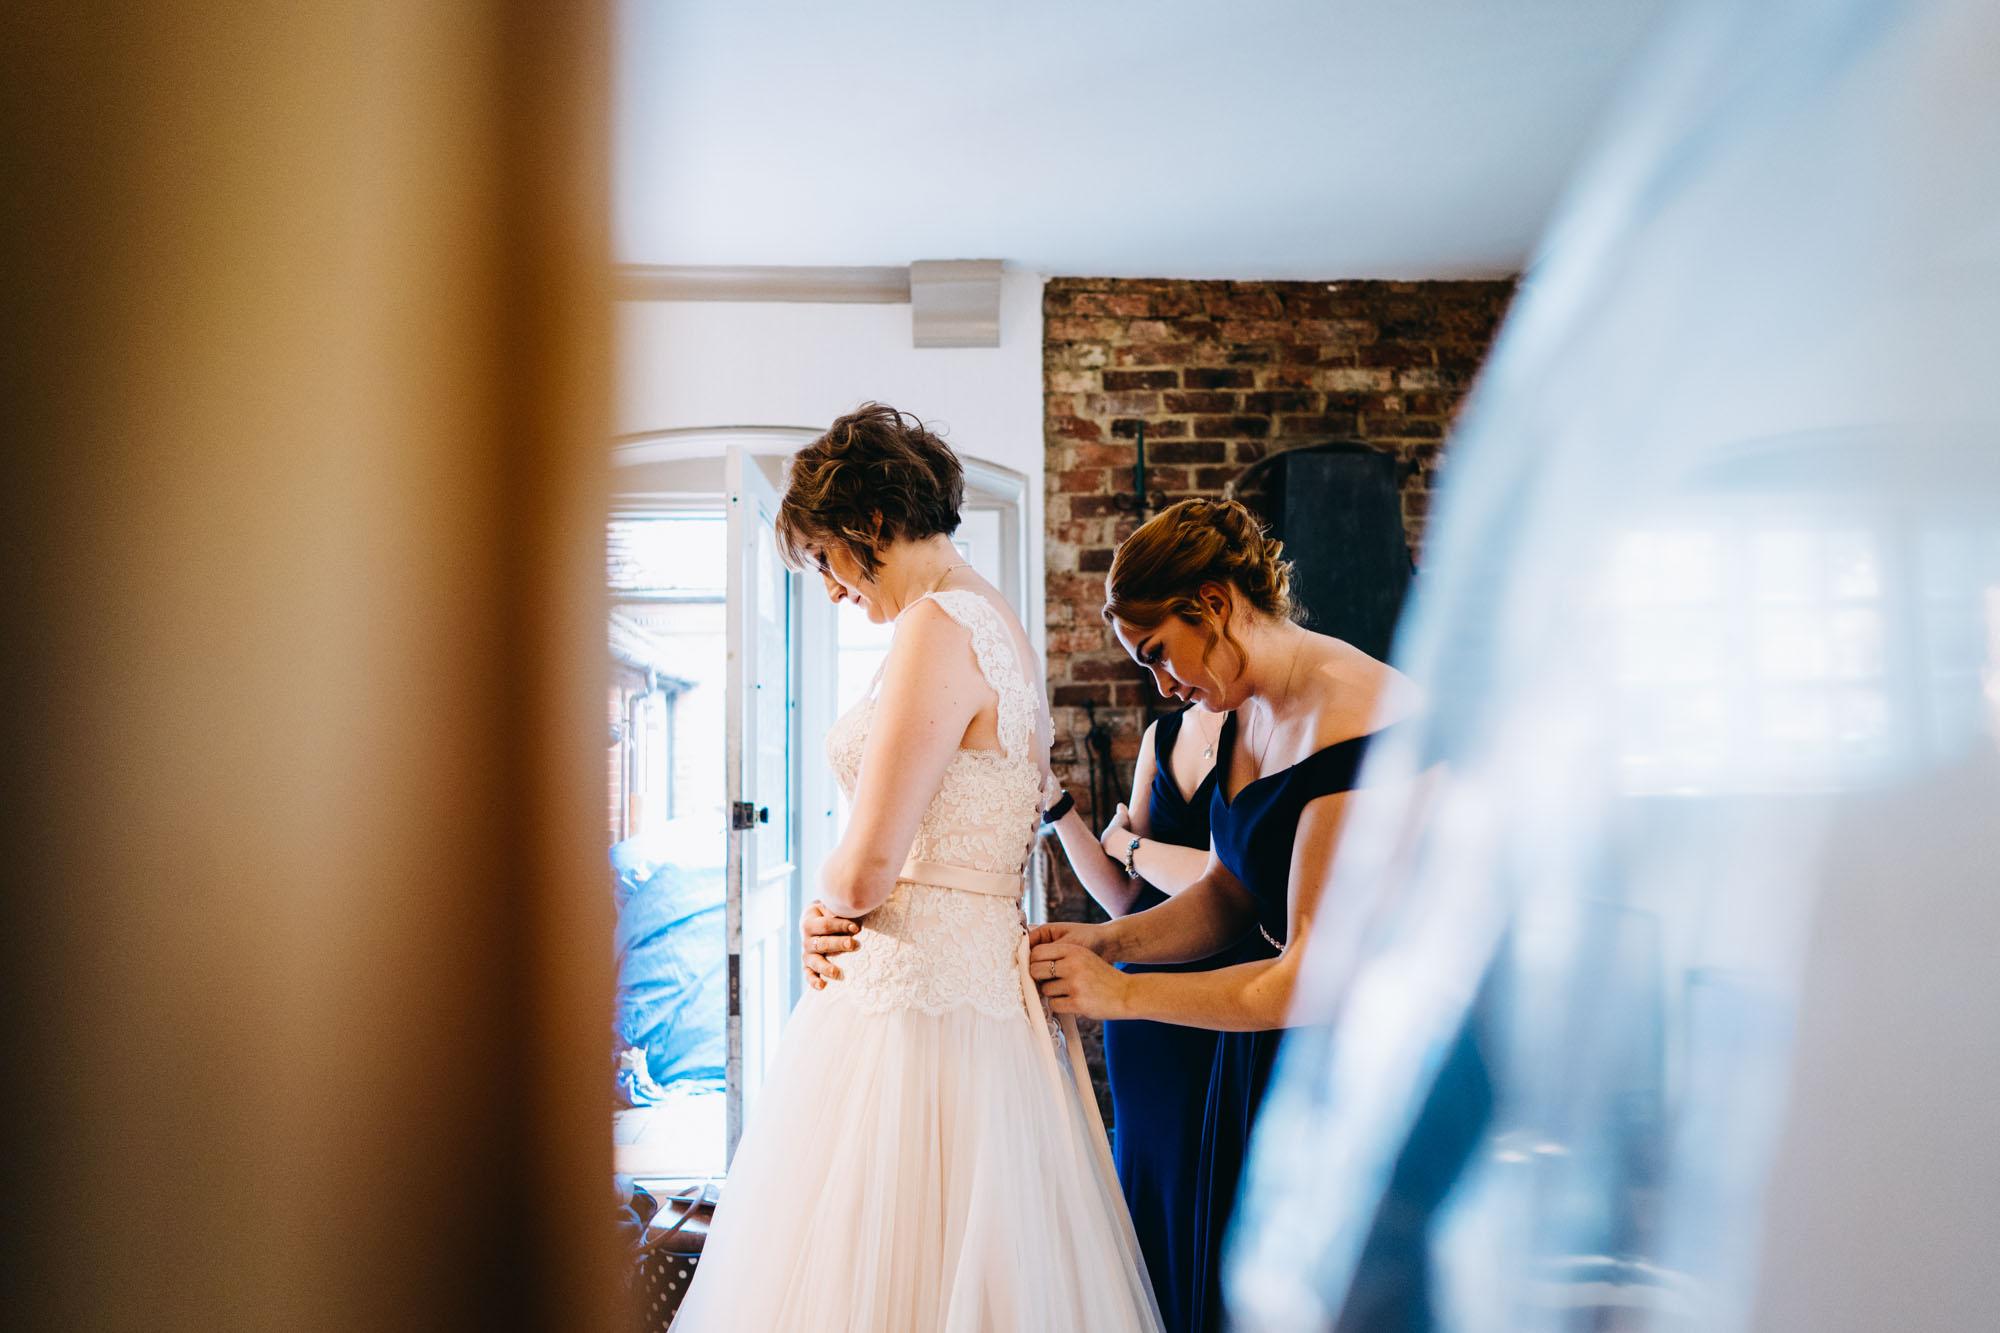 wedding-at-dodford-manor-13